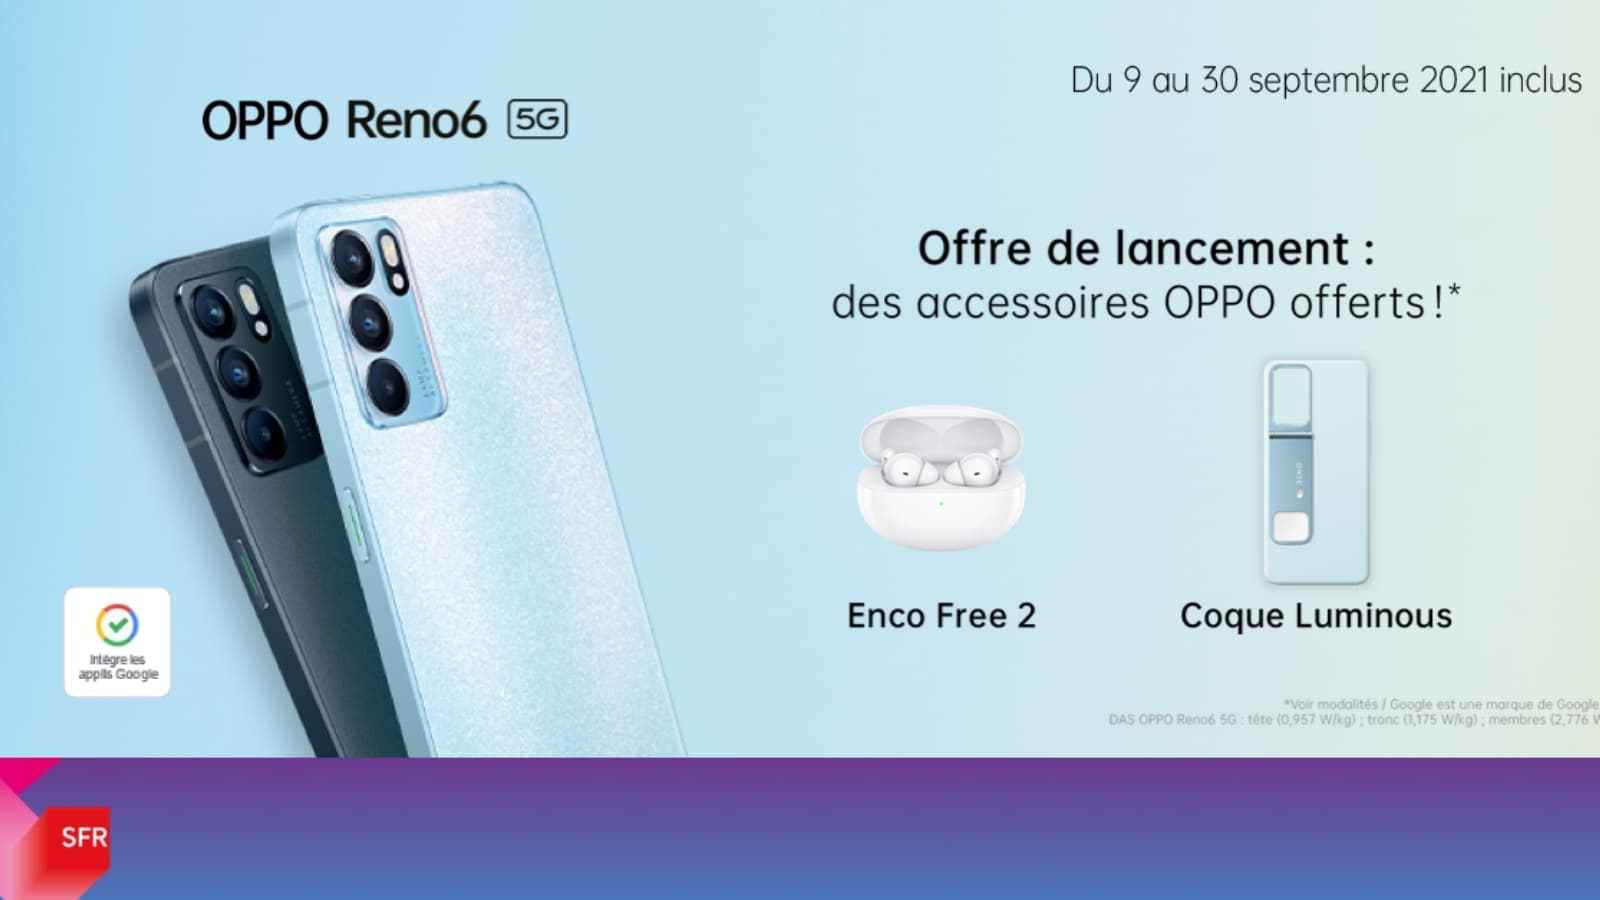 Précommandez le OPPO Reno6 5G chez SFR